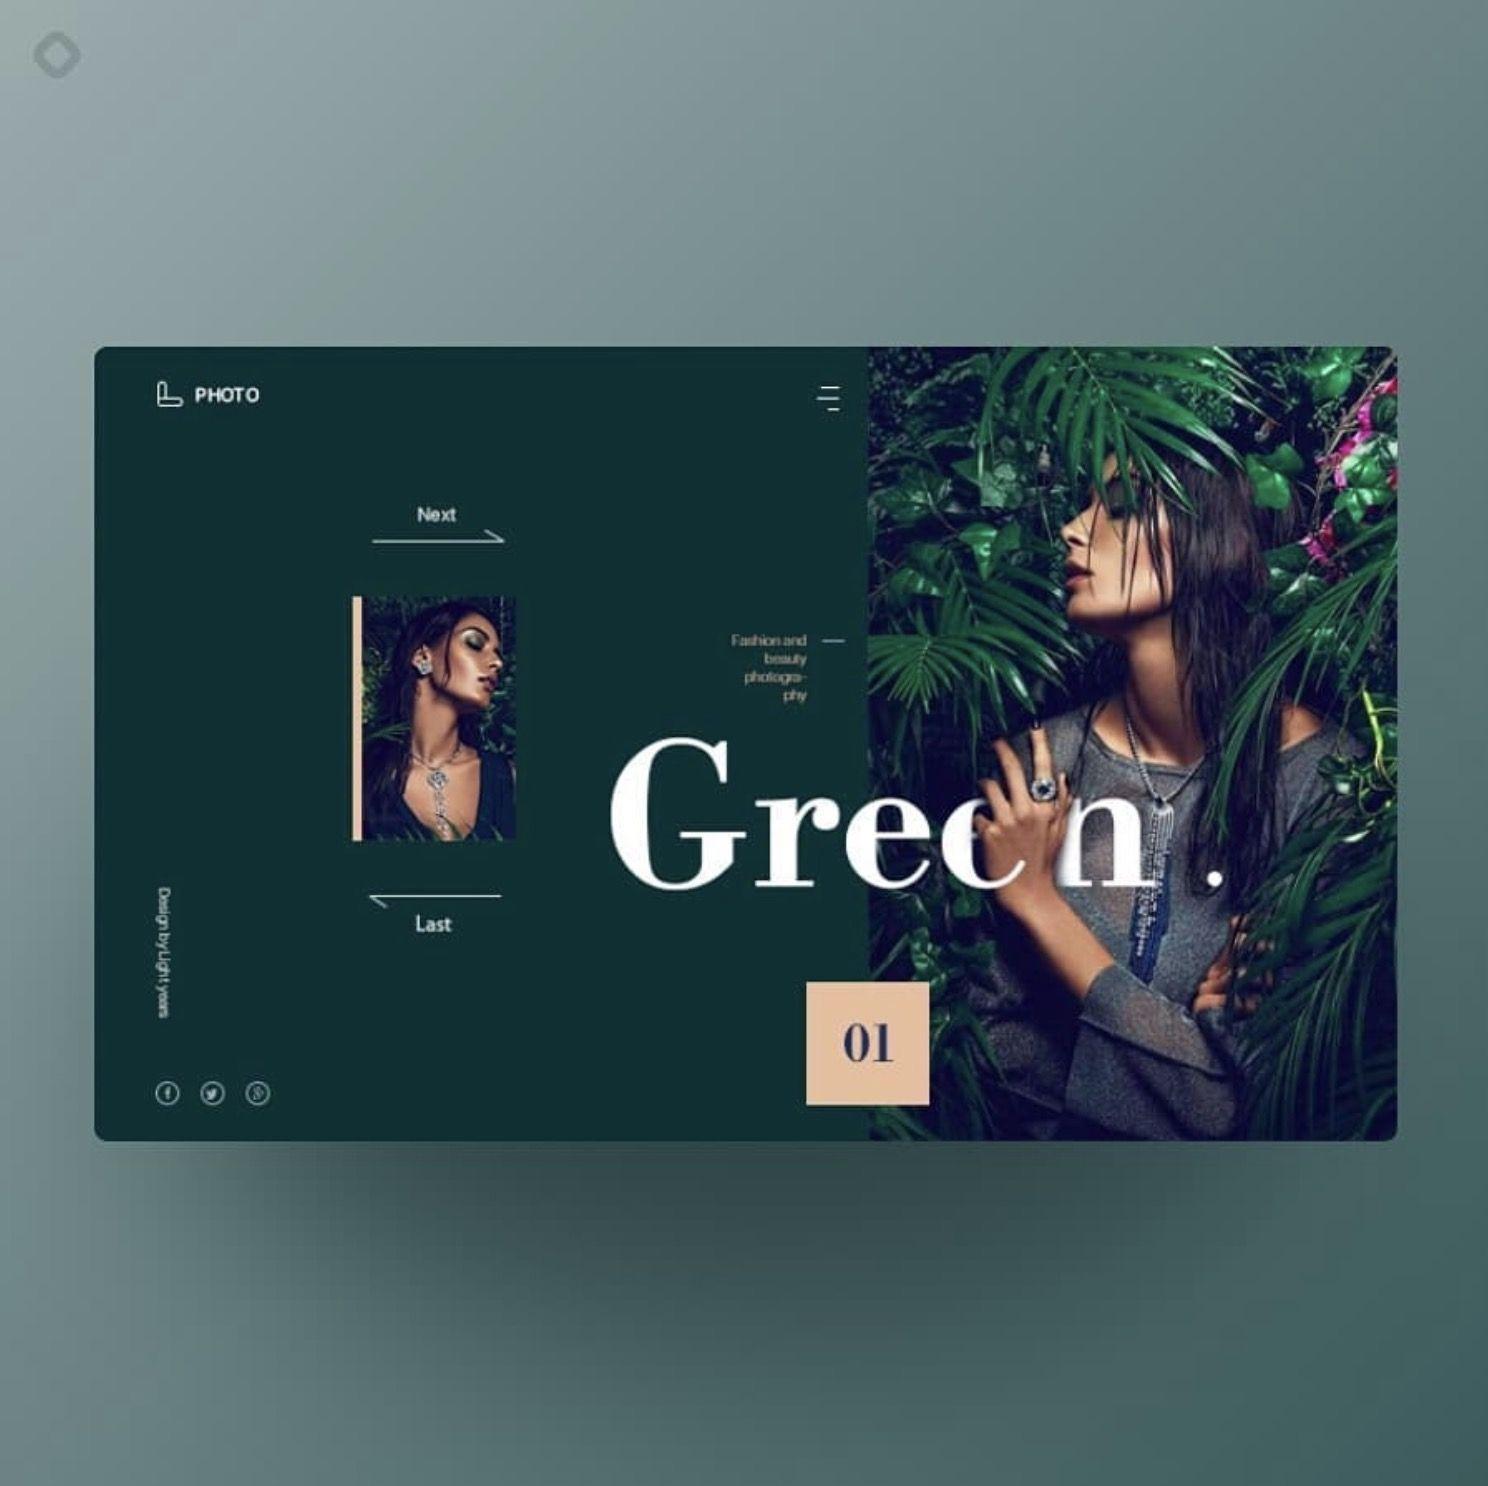 Web Design Inspiration 2020 Stunning Website Examples Web Design Websites Web Design Inspiration Web Design Tips